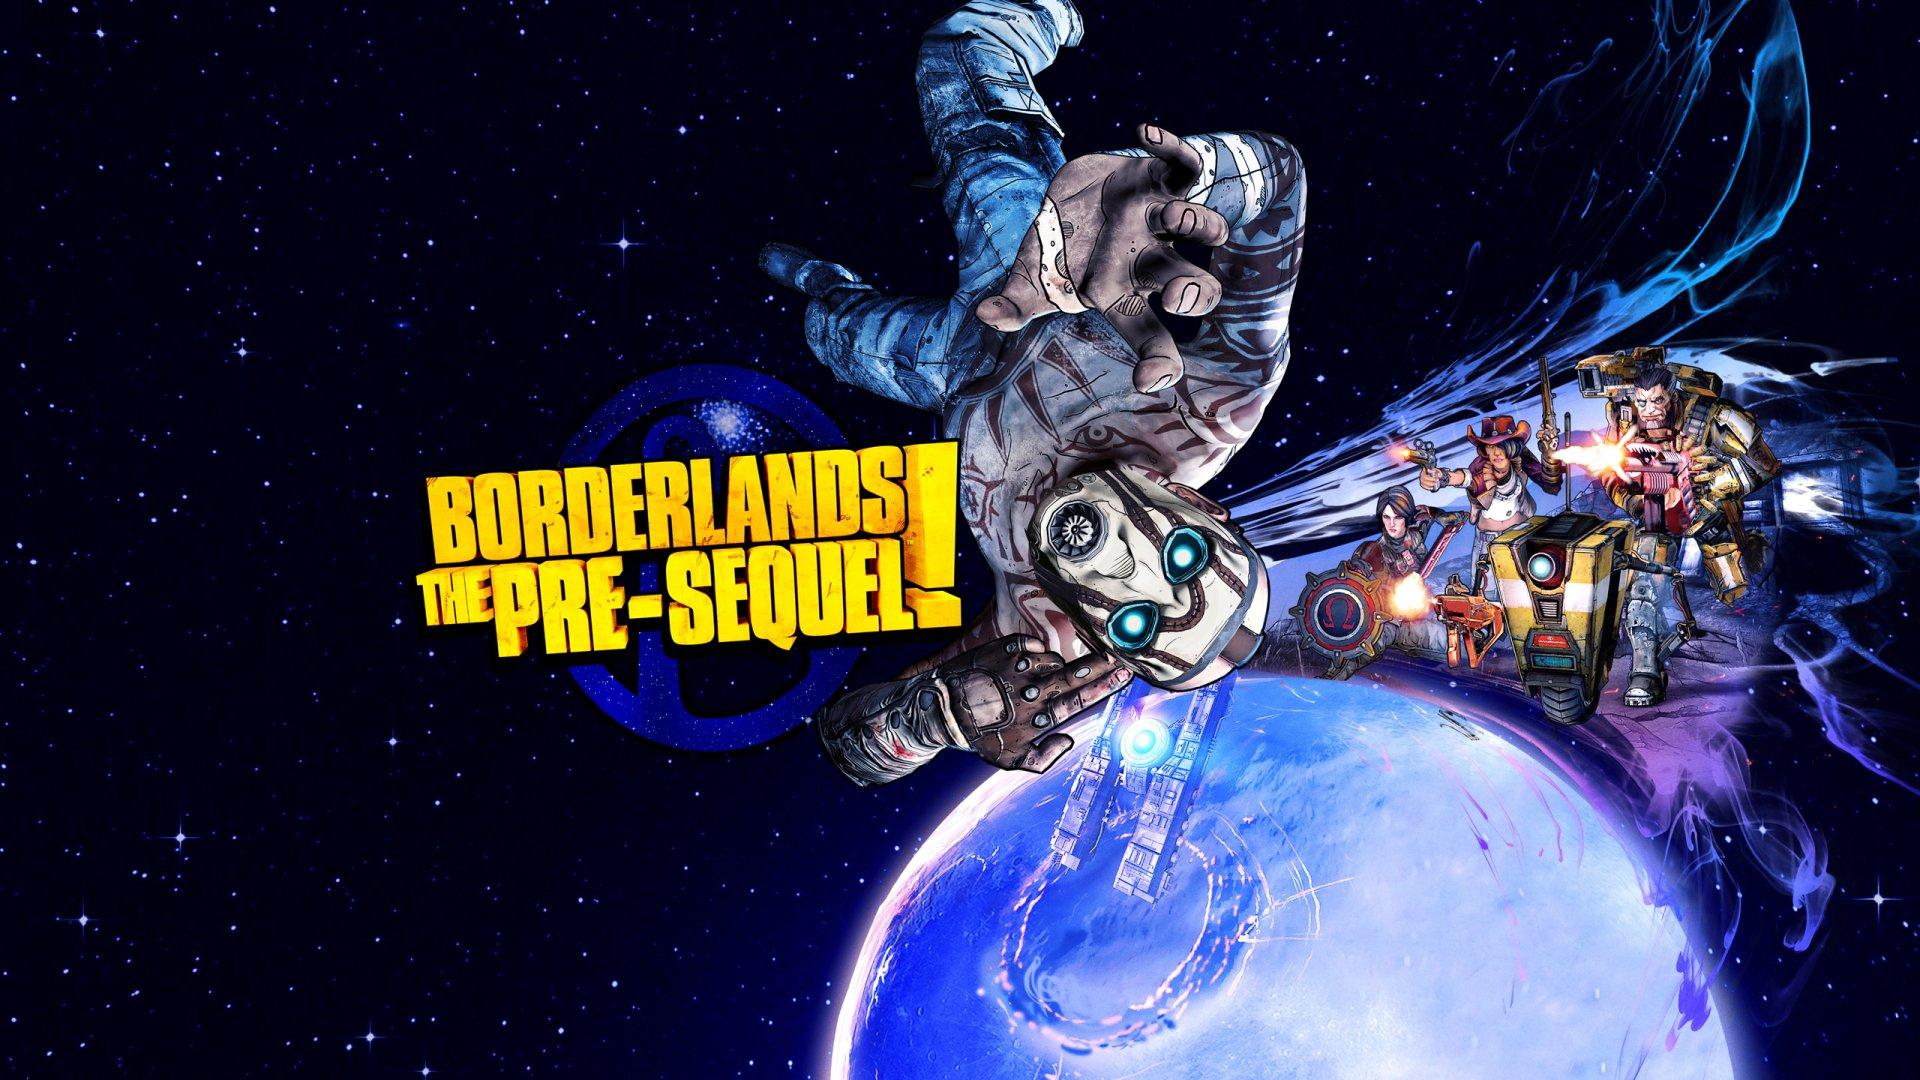 Borderlands: The Pre-Sequel Wallpaper HD